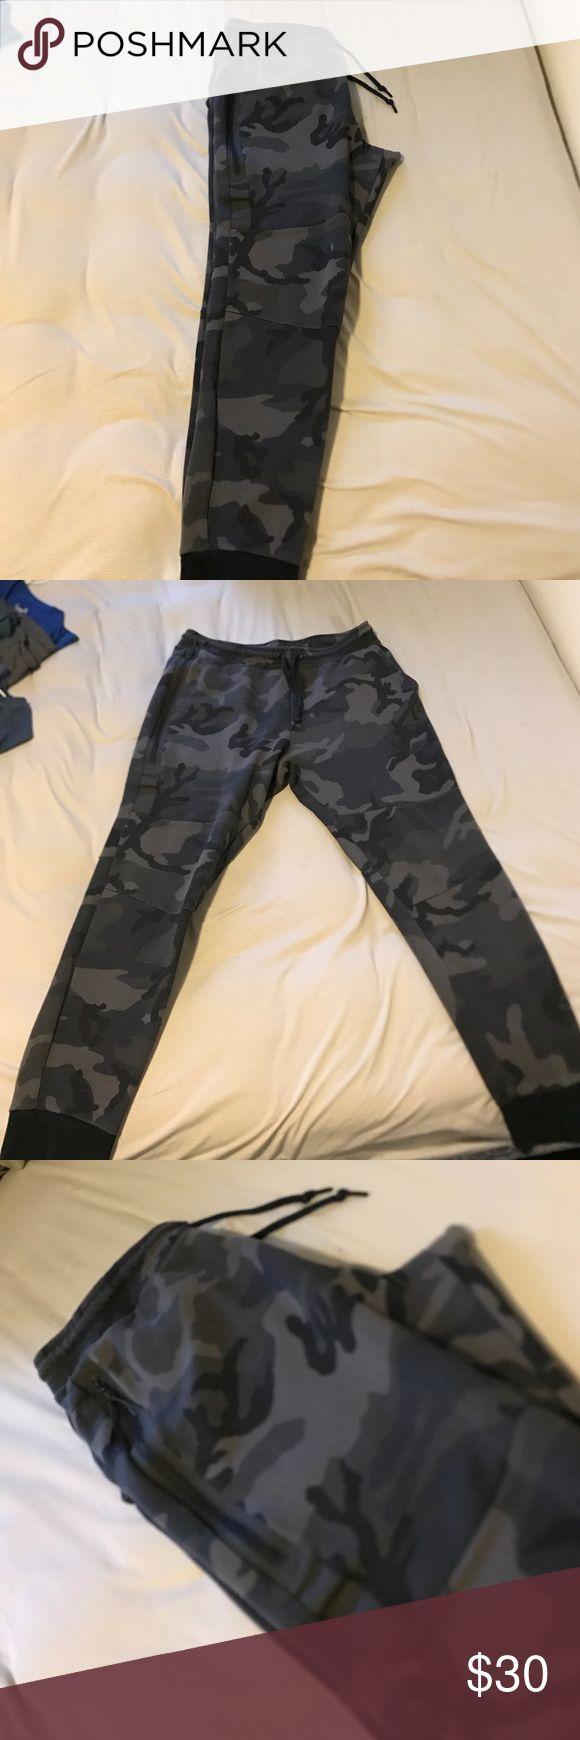 Nike Tech fleece joggers Nike tech fleece joggers Nike Pants Sweatpants & Joggers